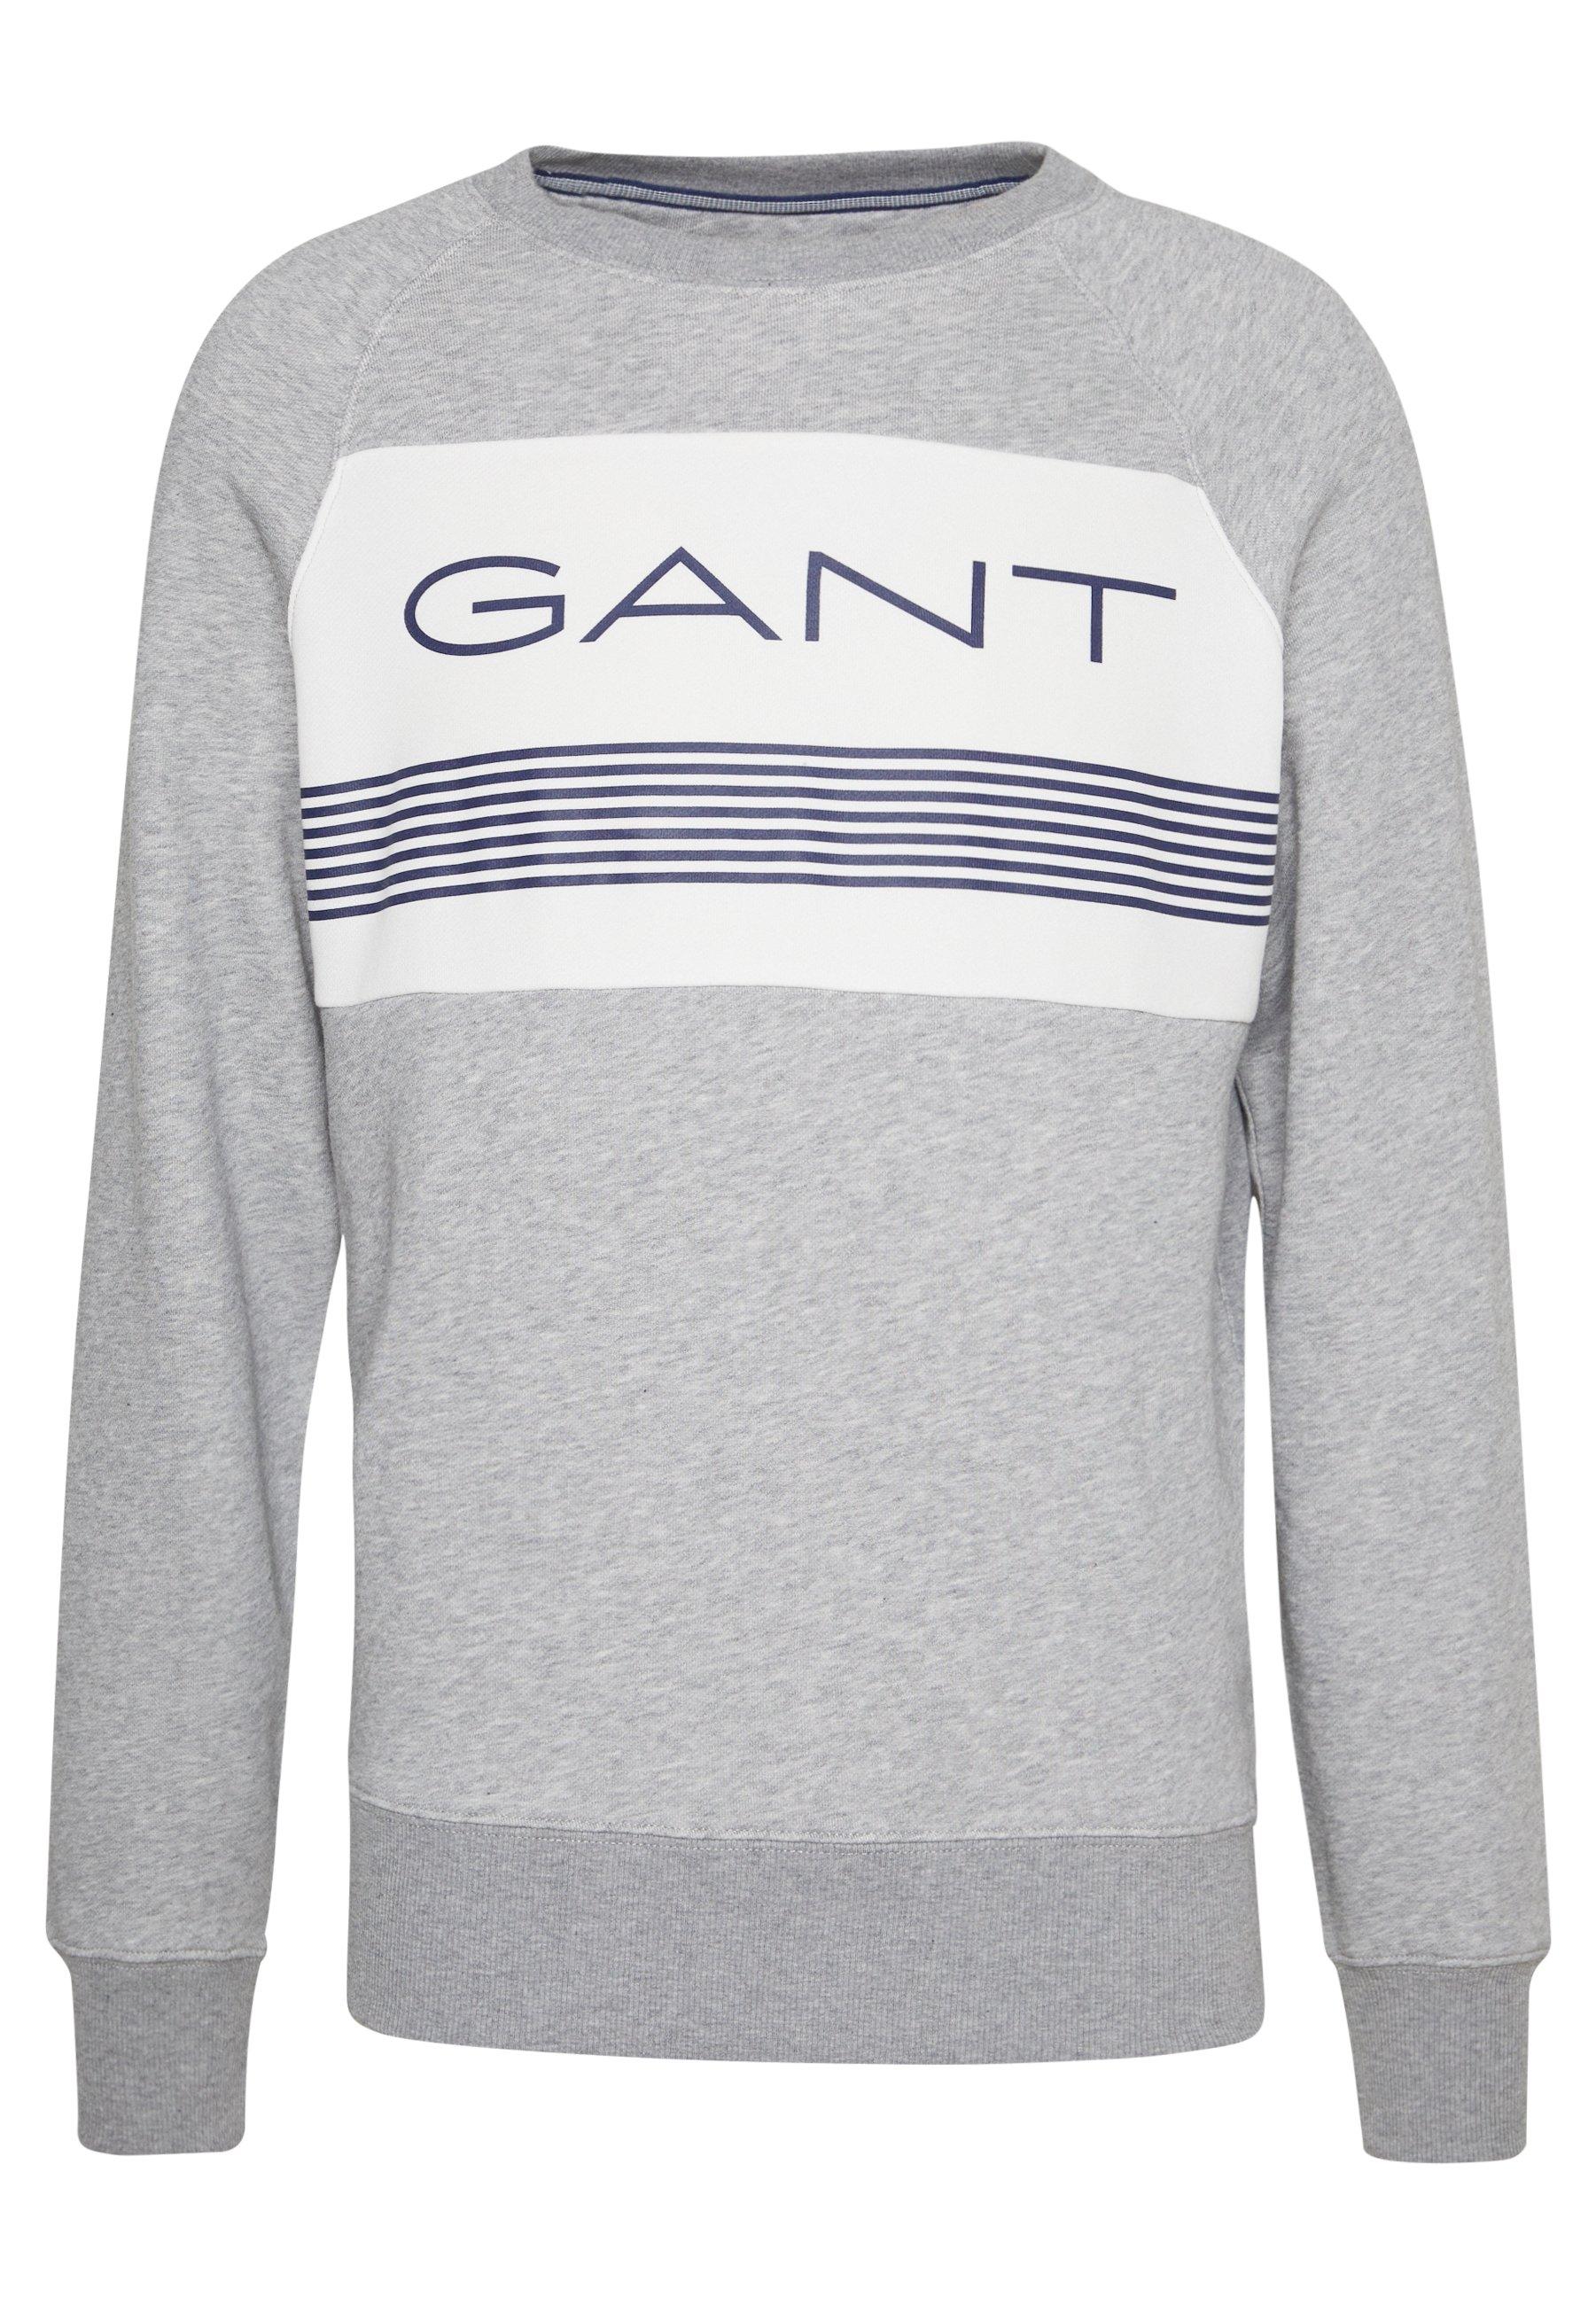 GANT Crew Neck Sweatshirt Black hos